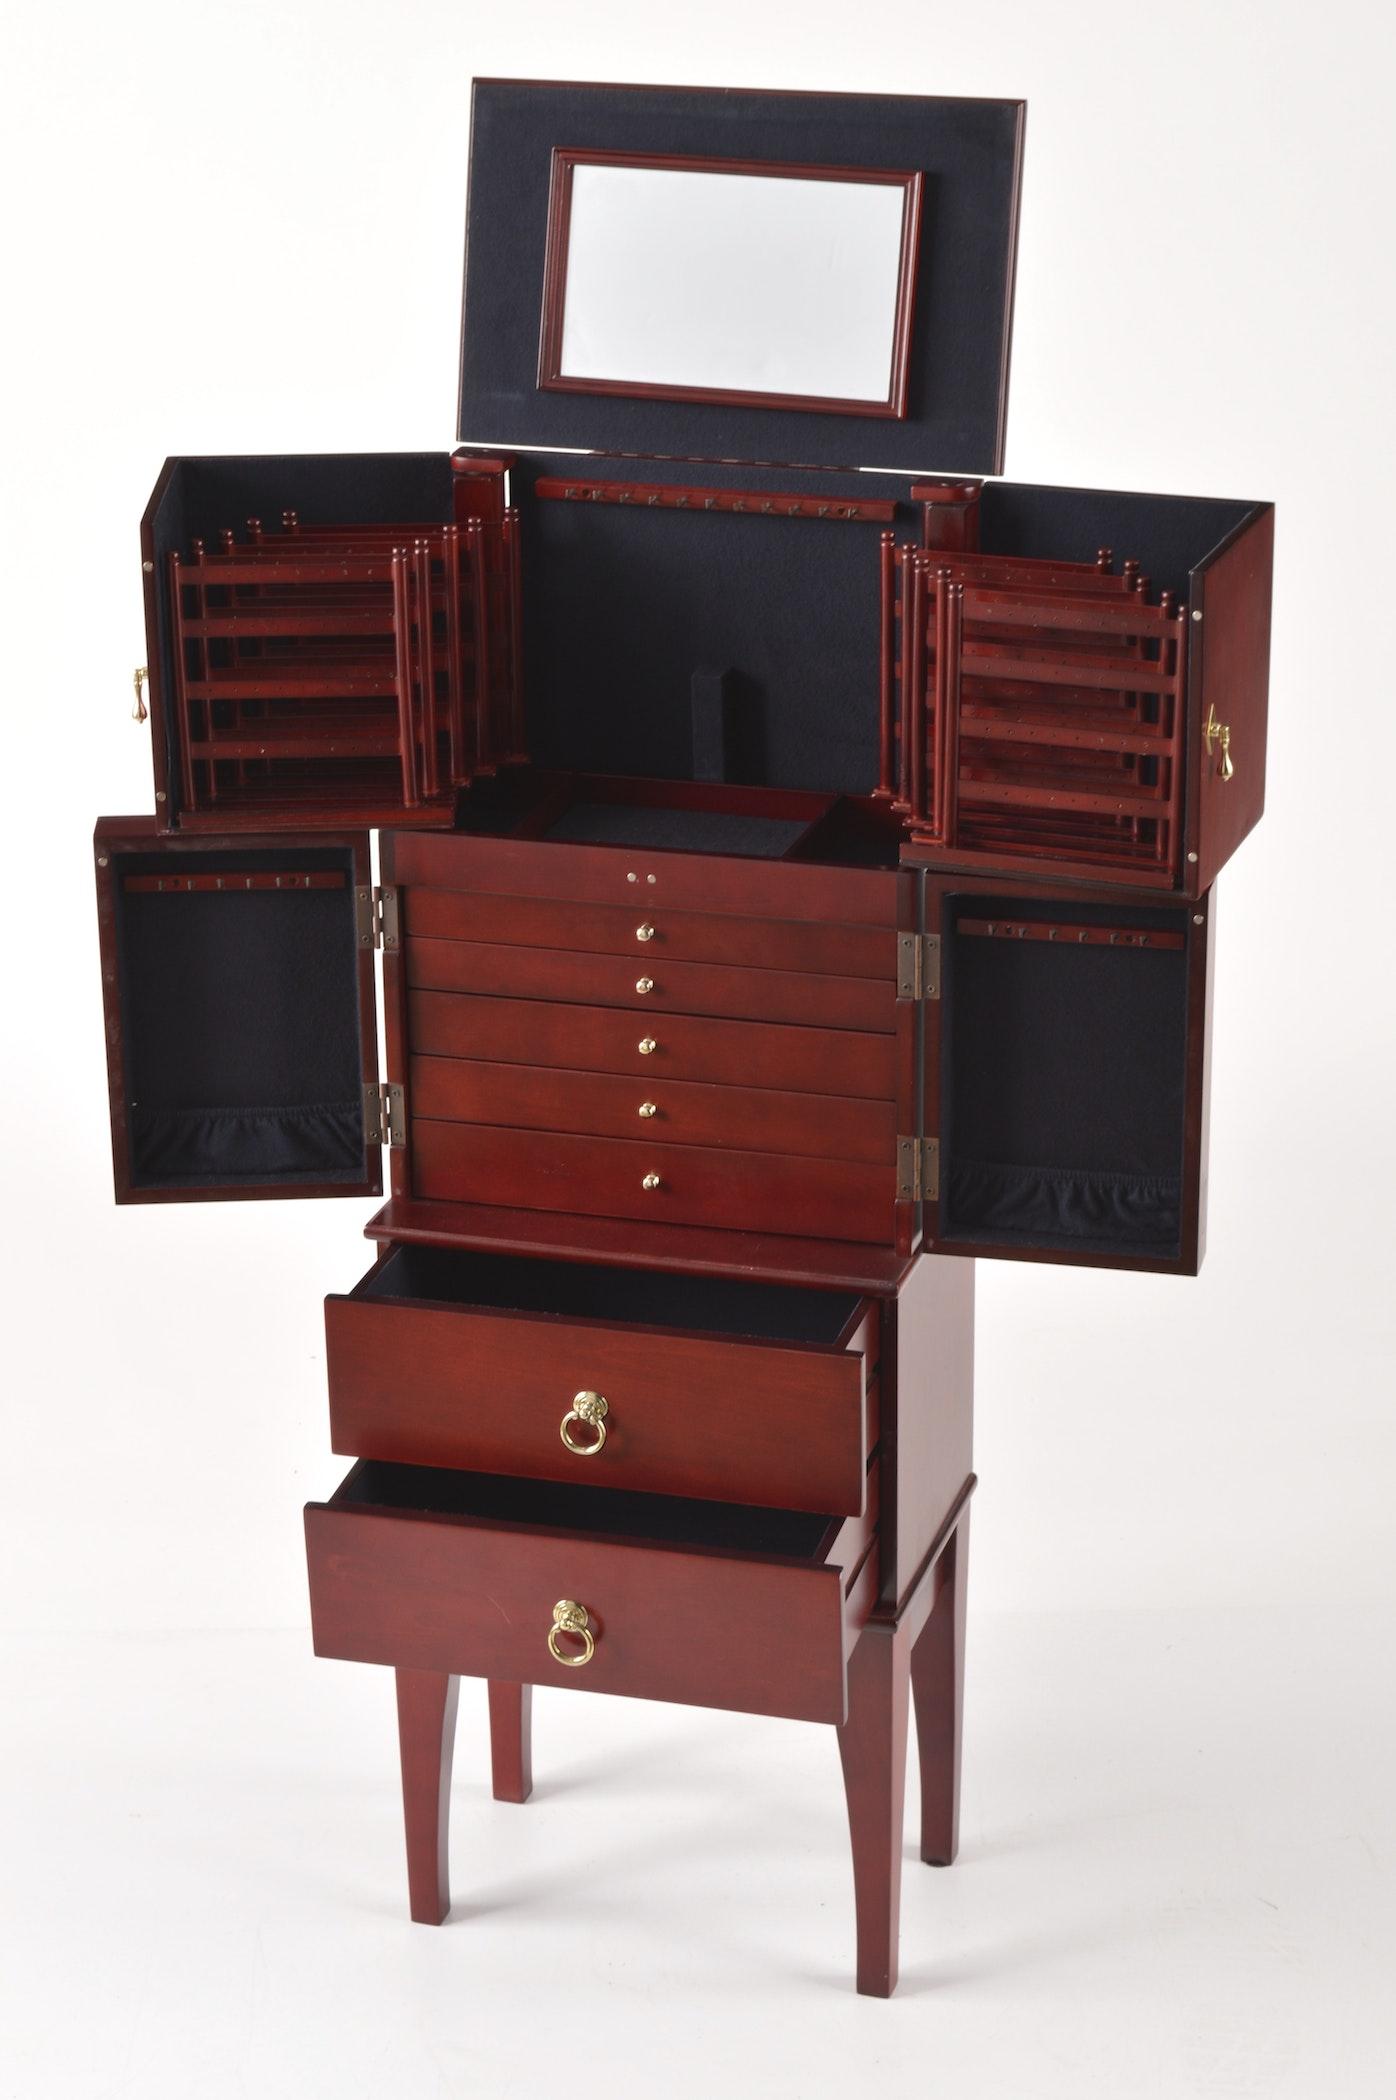 Jewelry Armoire From Lori Greiner | EBTH